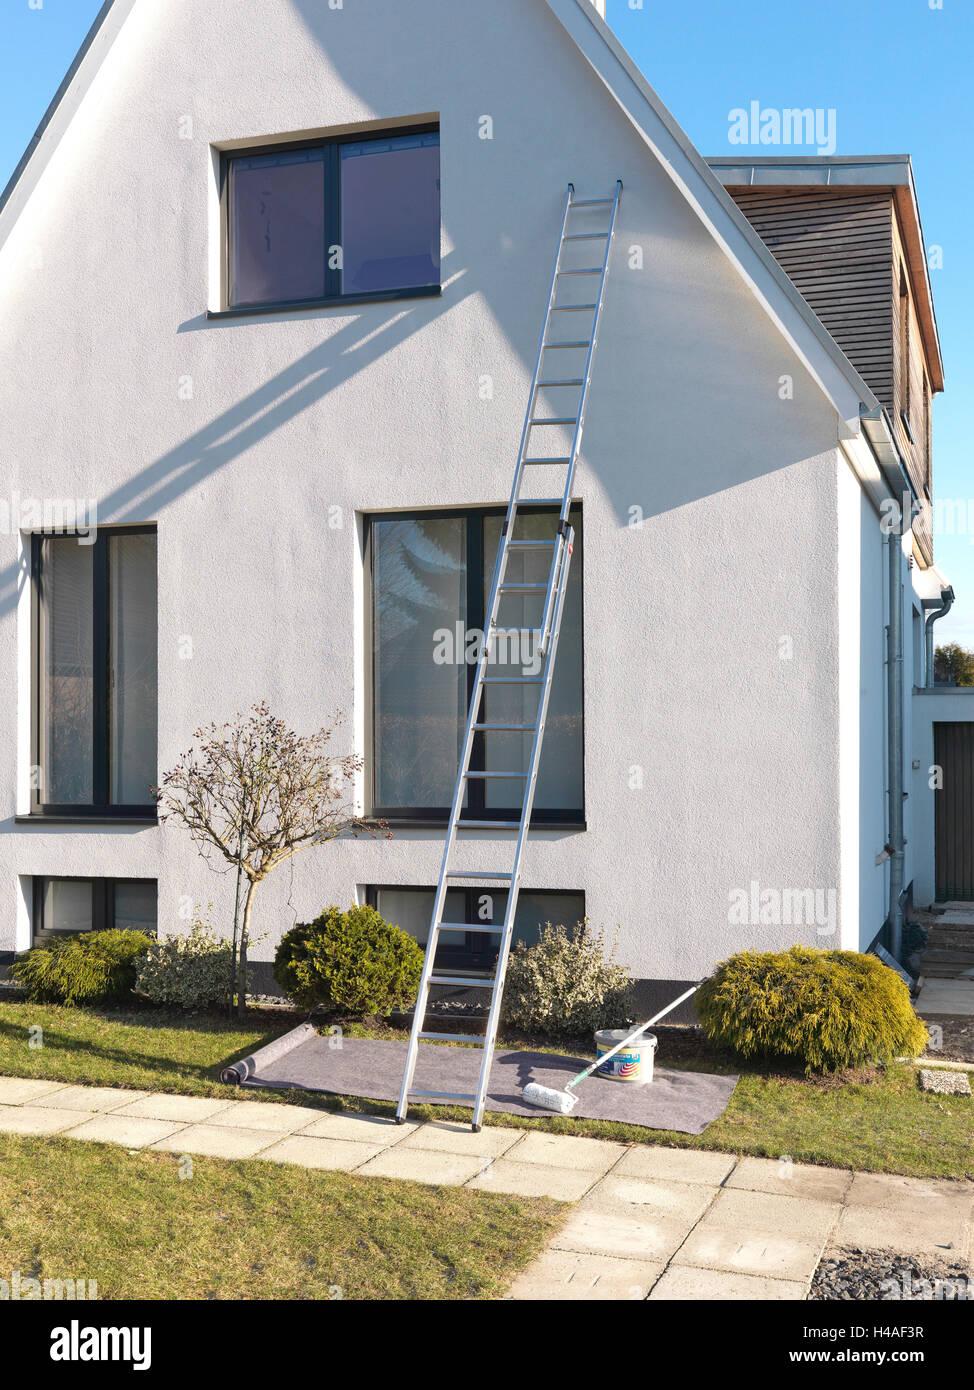 Haus, Fassade, gleiten, hohen, Leiter,Stockfoto